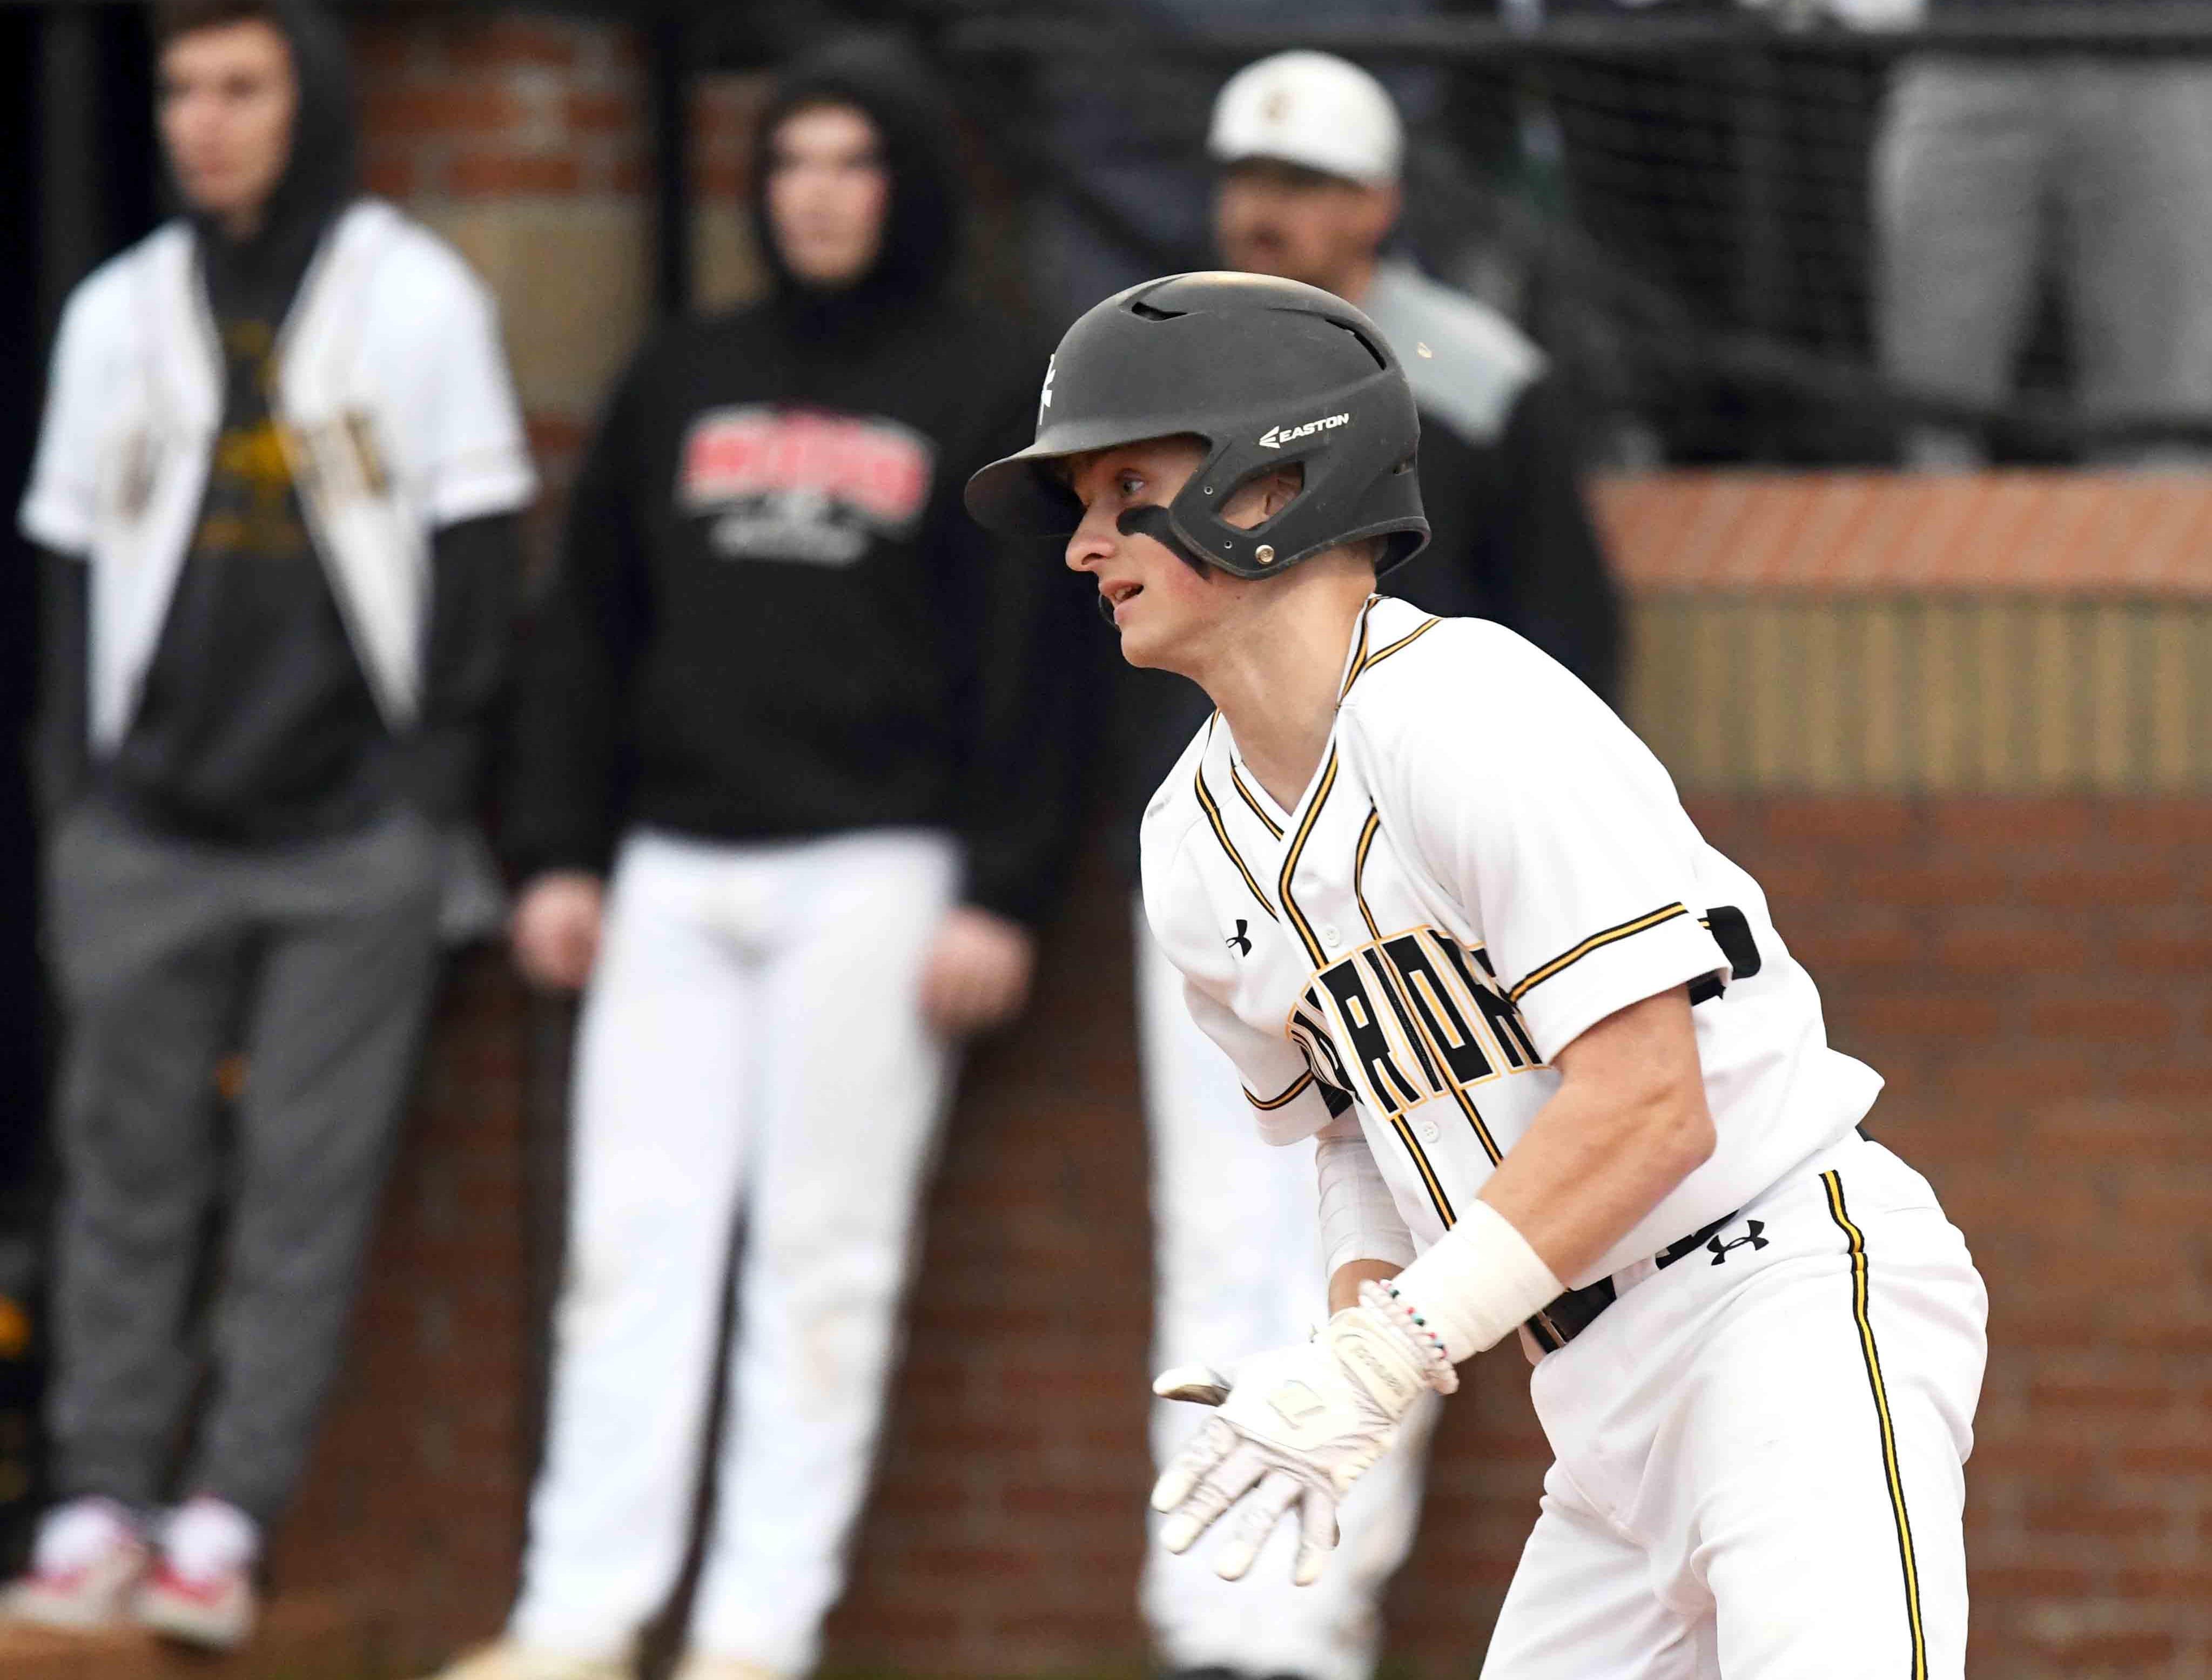 Oak Grove junior Liam Breithaupt runs to first base in their season opener against Seminary in Hattiesburg on Monday, February 18, 2019.